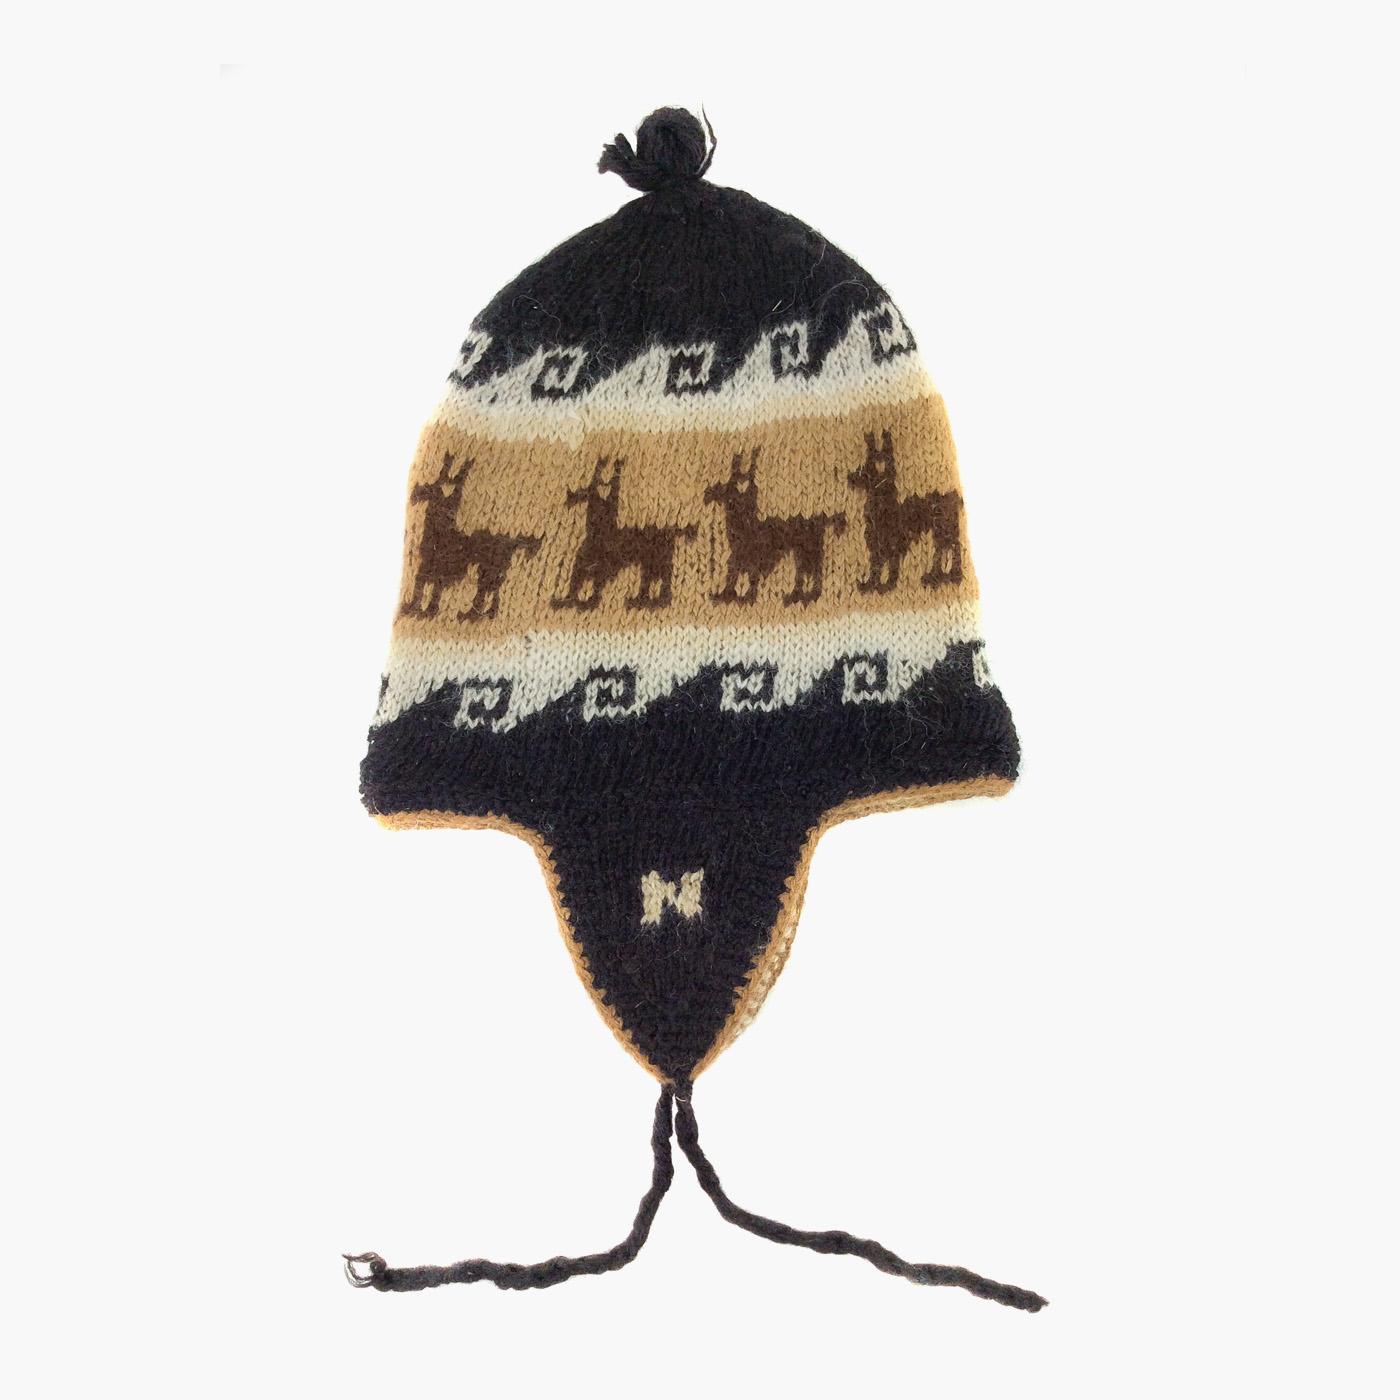 1ebf268191f 100% Alpaca Wool Hand Knitted Hat